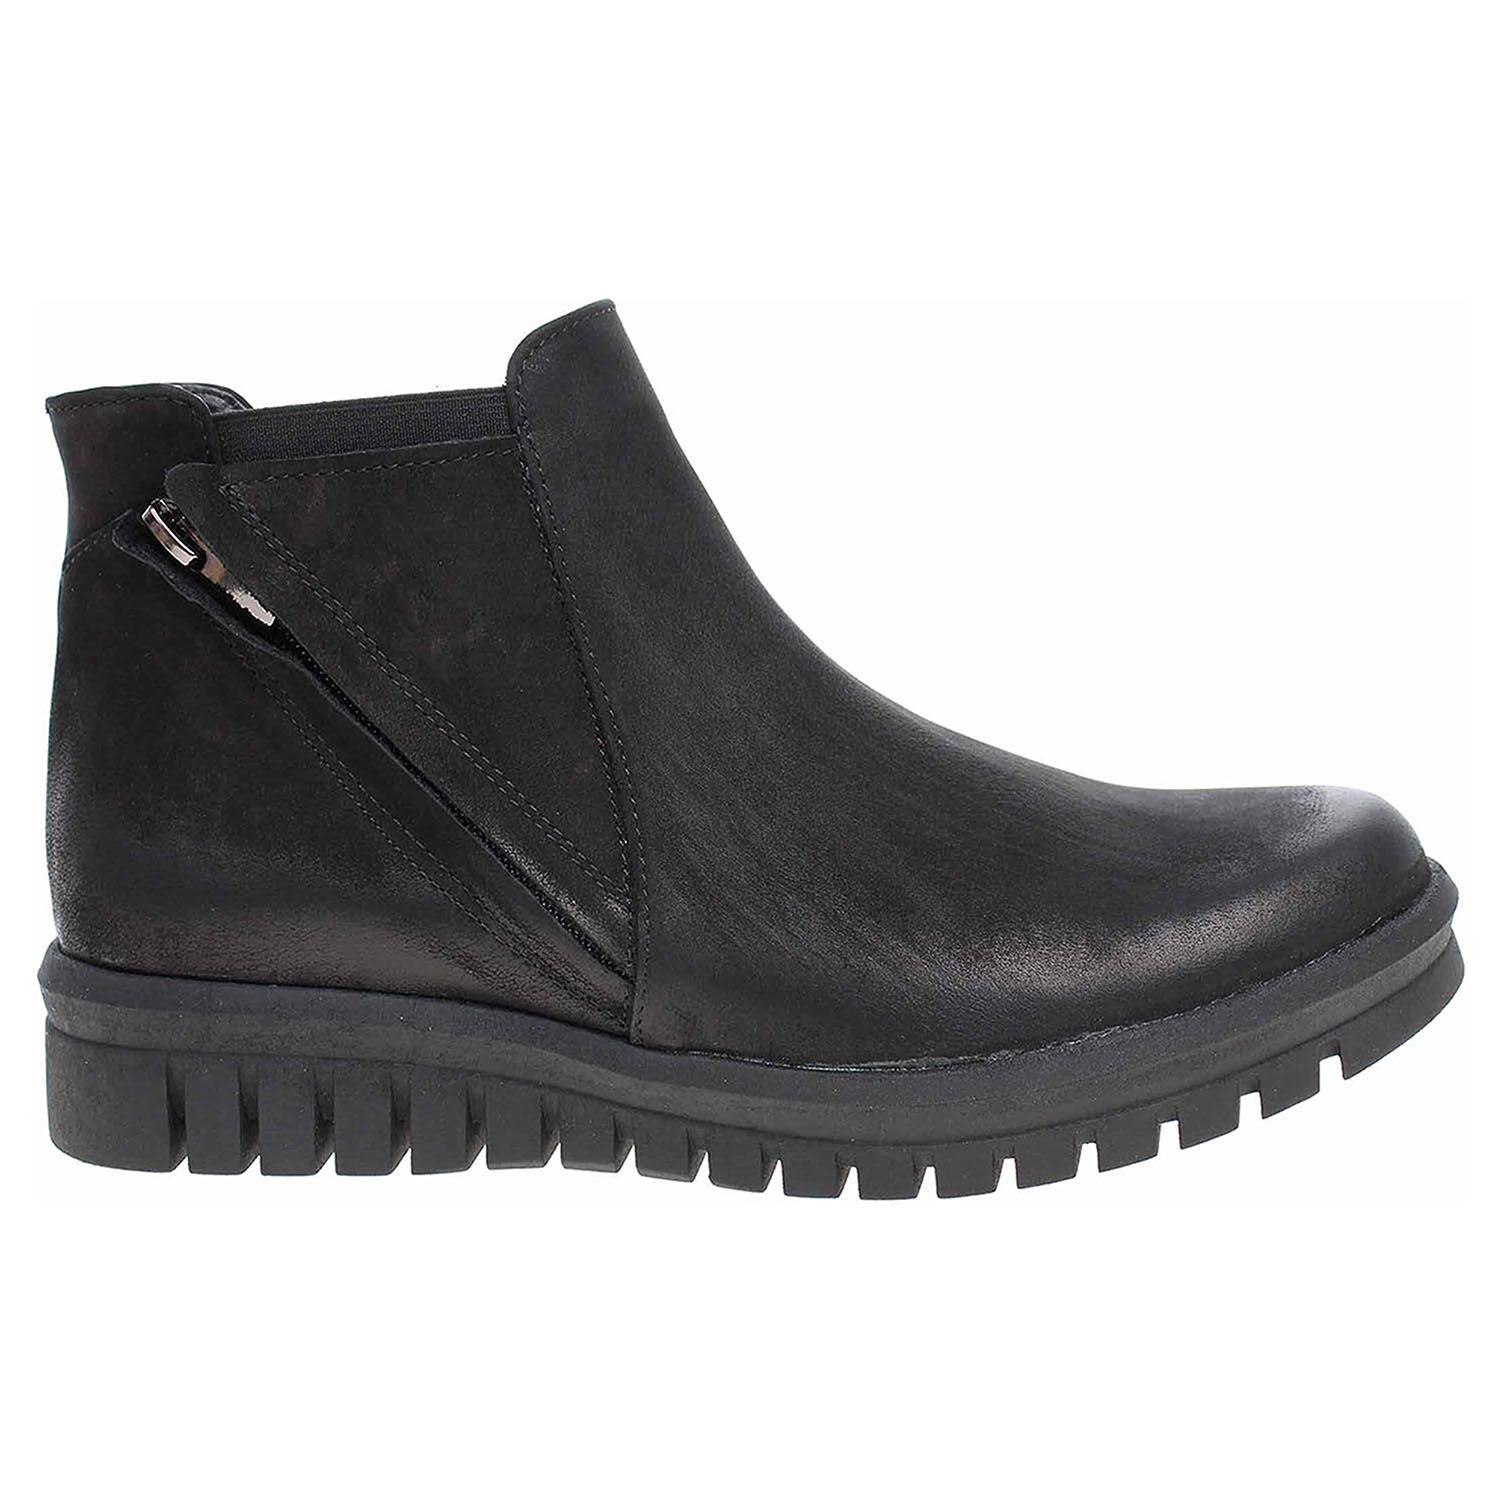 Ecco Dámská obuv J3880 černá nubuk 22600976 1849b8edc81